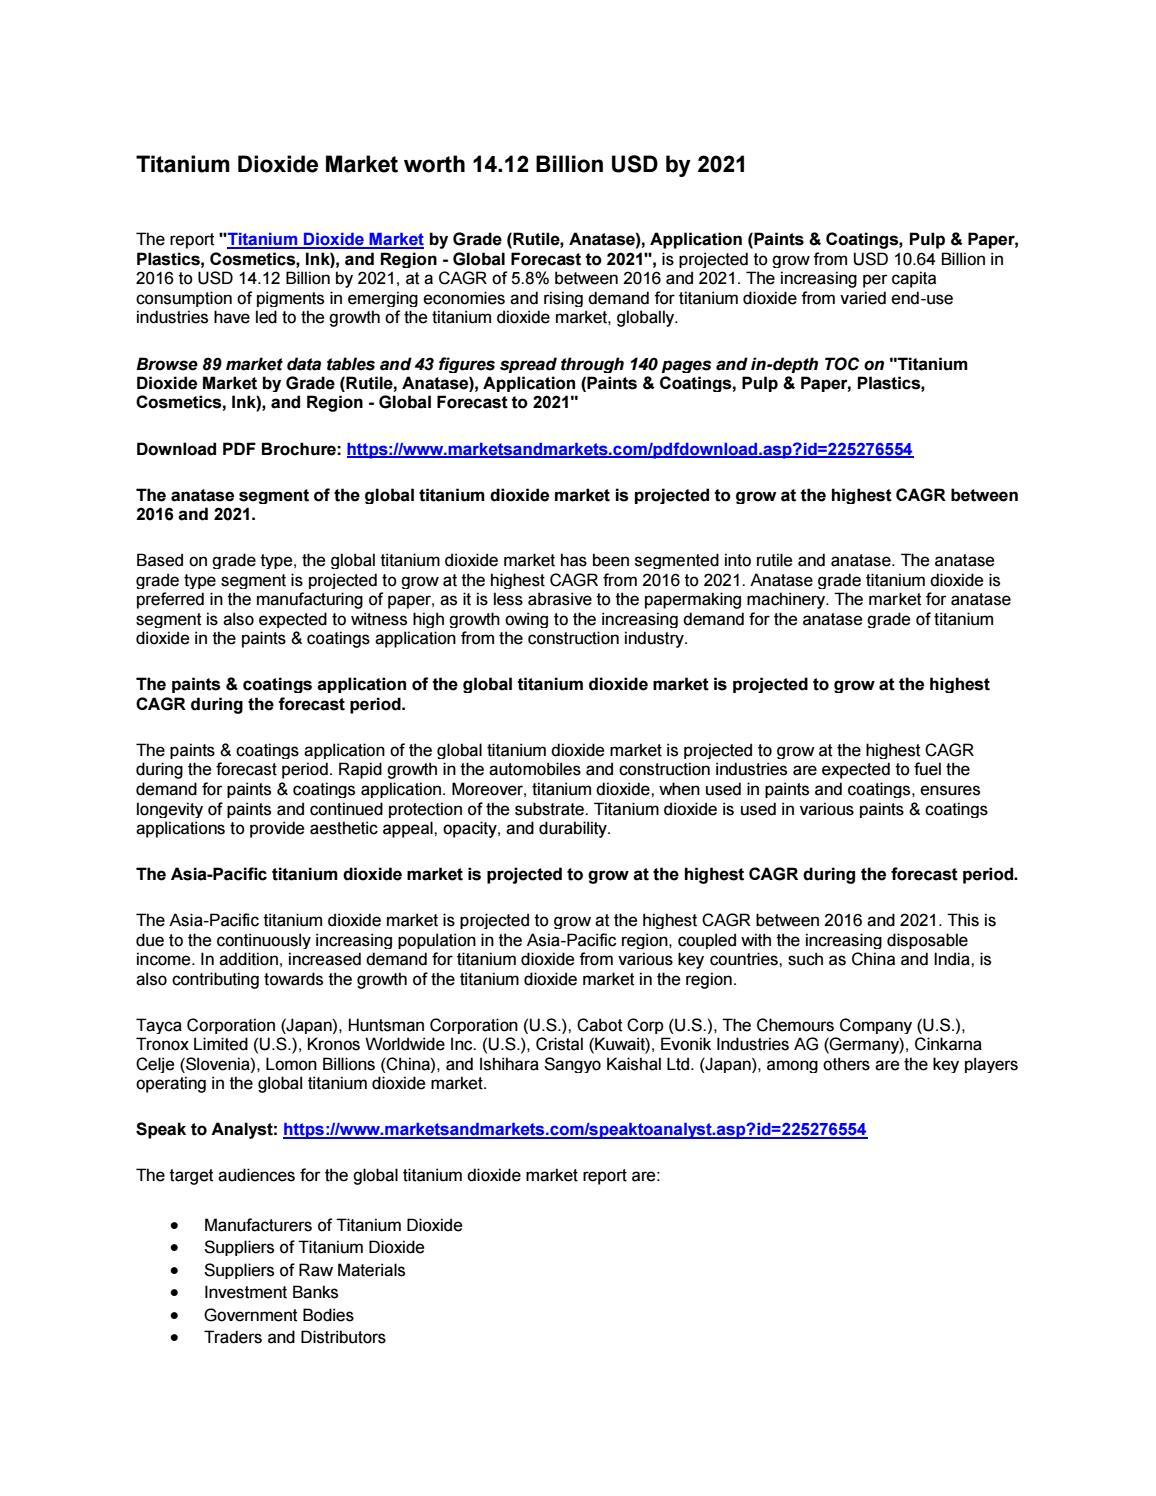 Titanium Dioxide Market worth 14 12 Billion USD by 2021 by abhijjetw